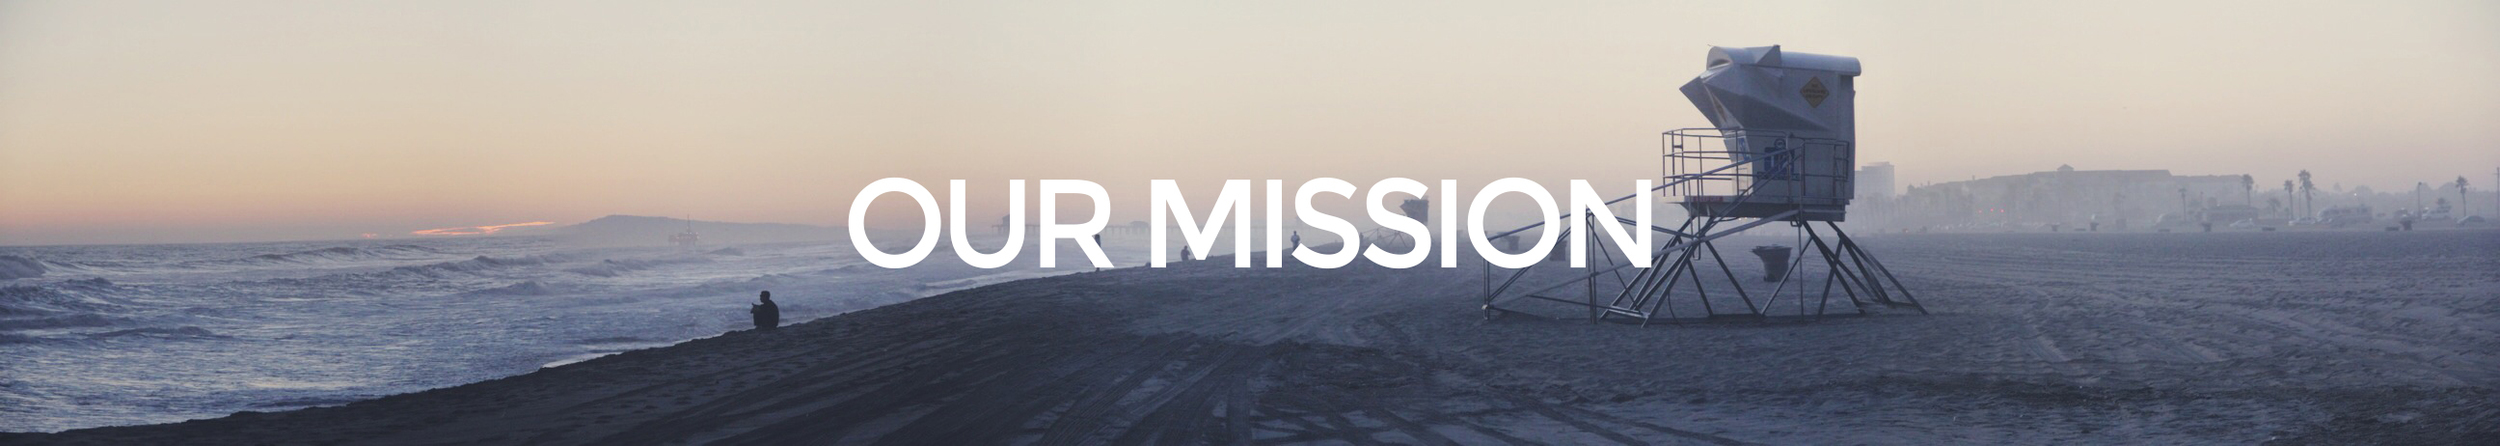 Mission_image.jpg